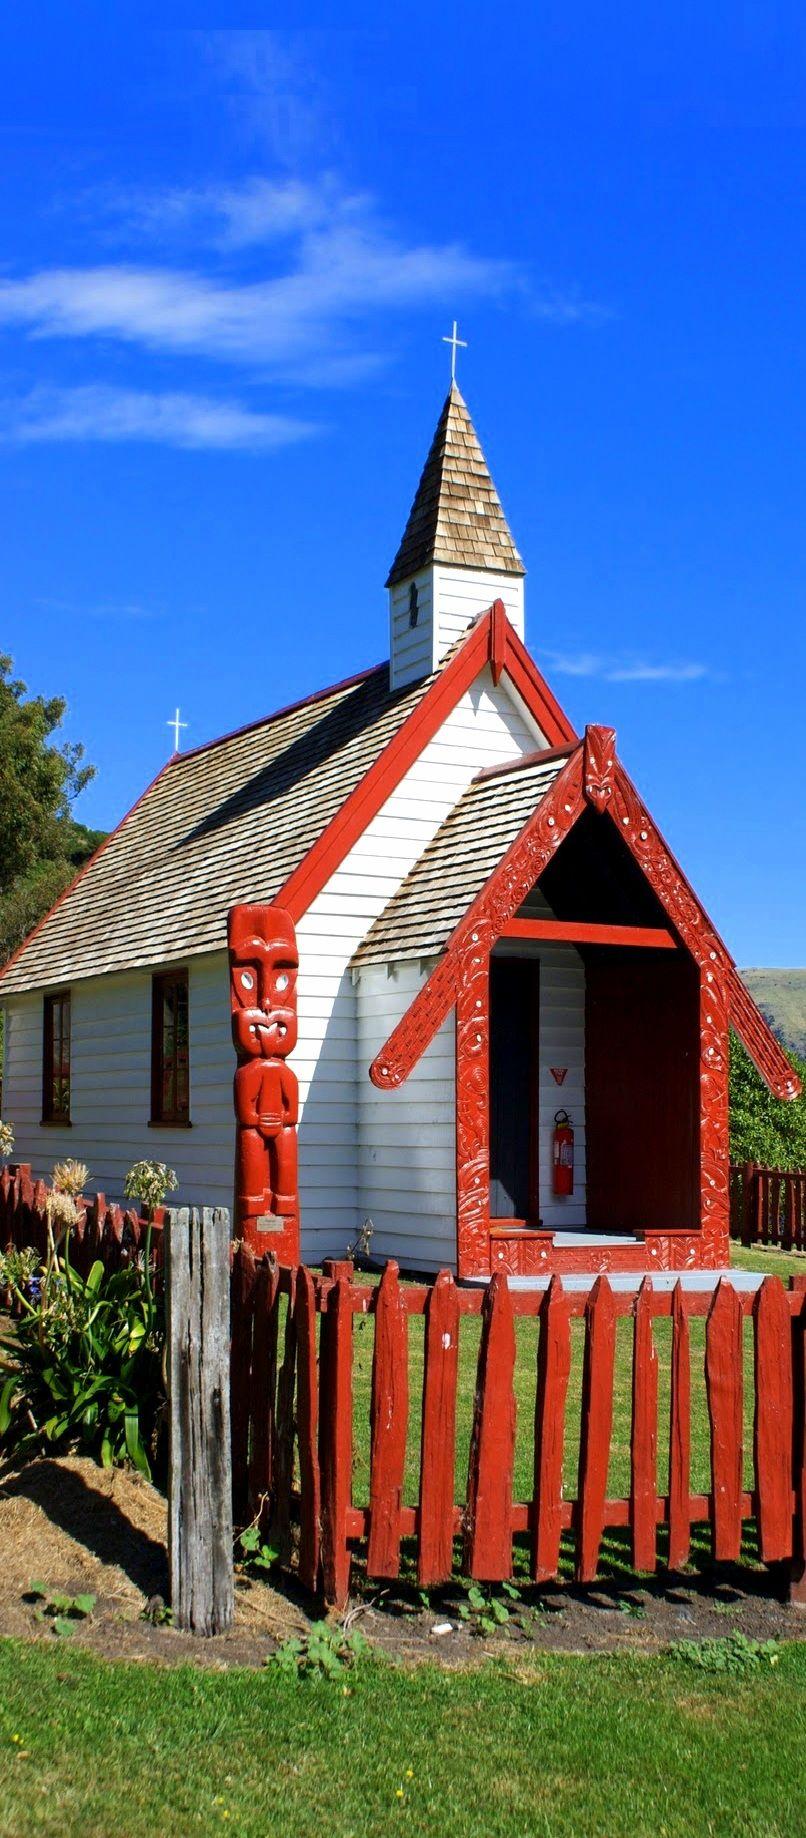 Onuku Church The Kaik Akaroa Nz New Zealand Holidays New Zealand South Island New Zealand Travel